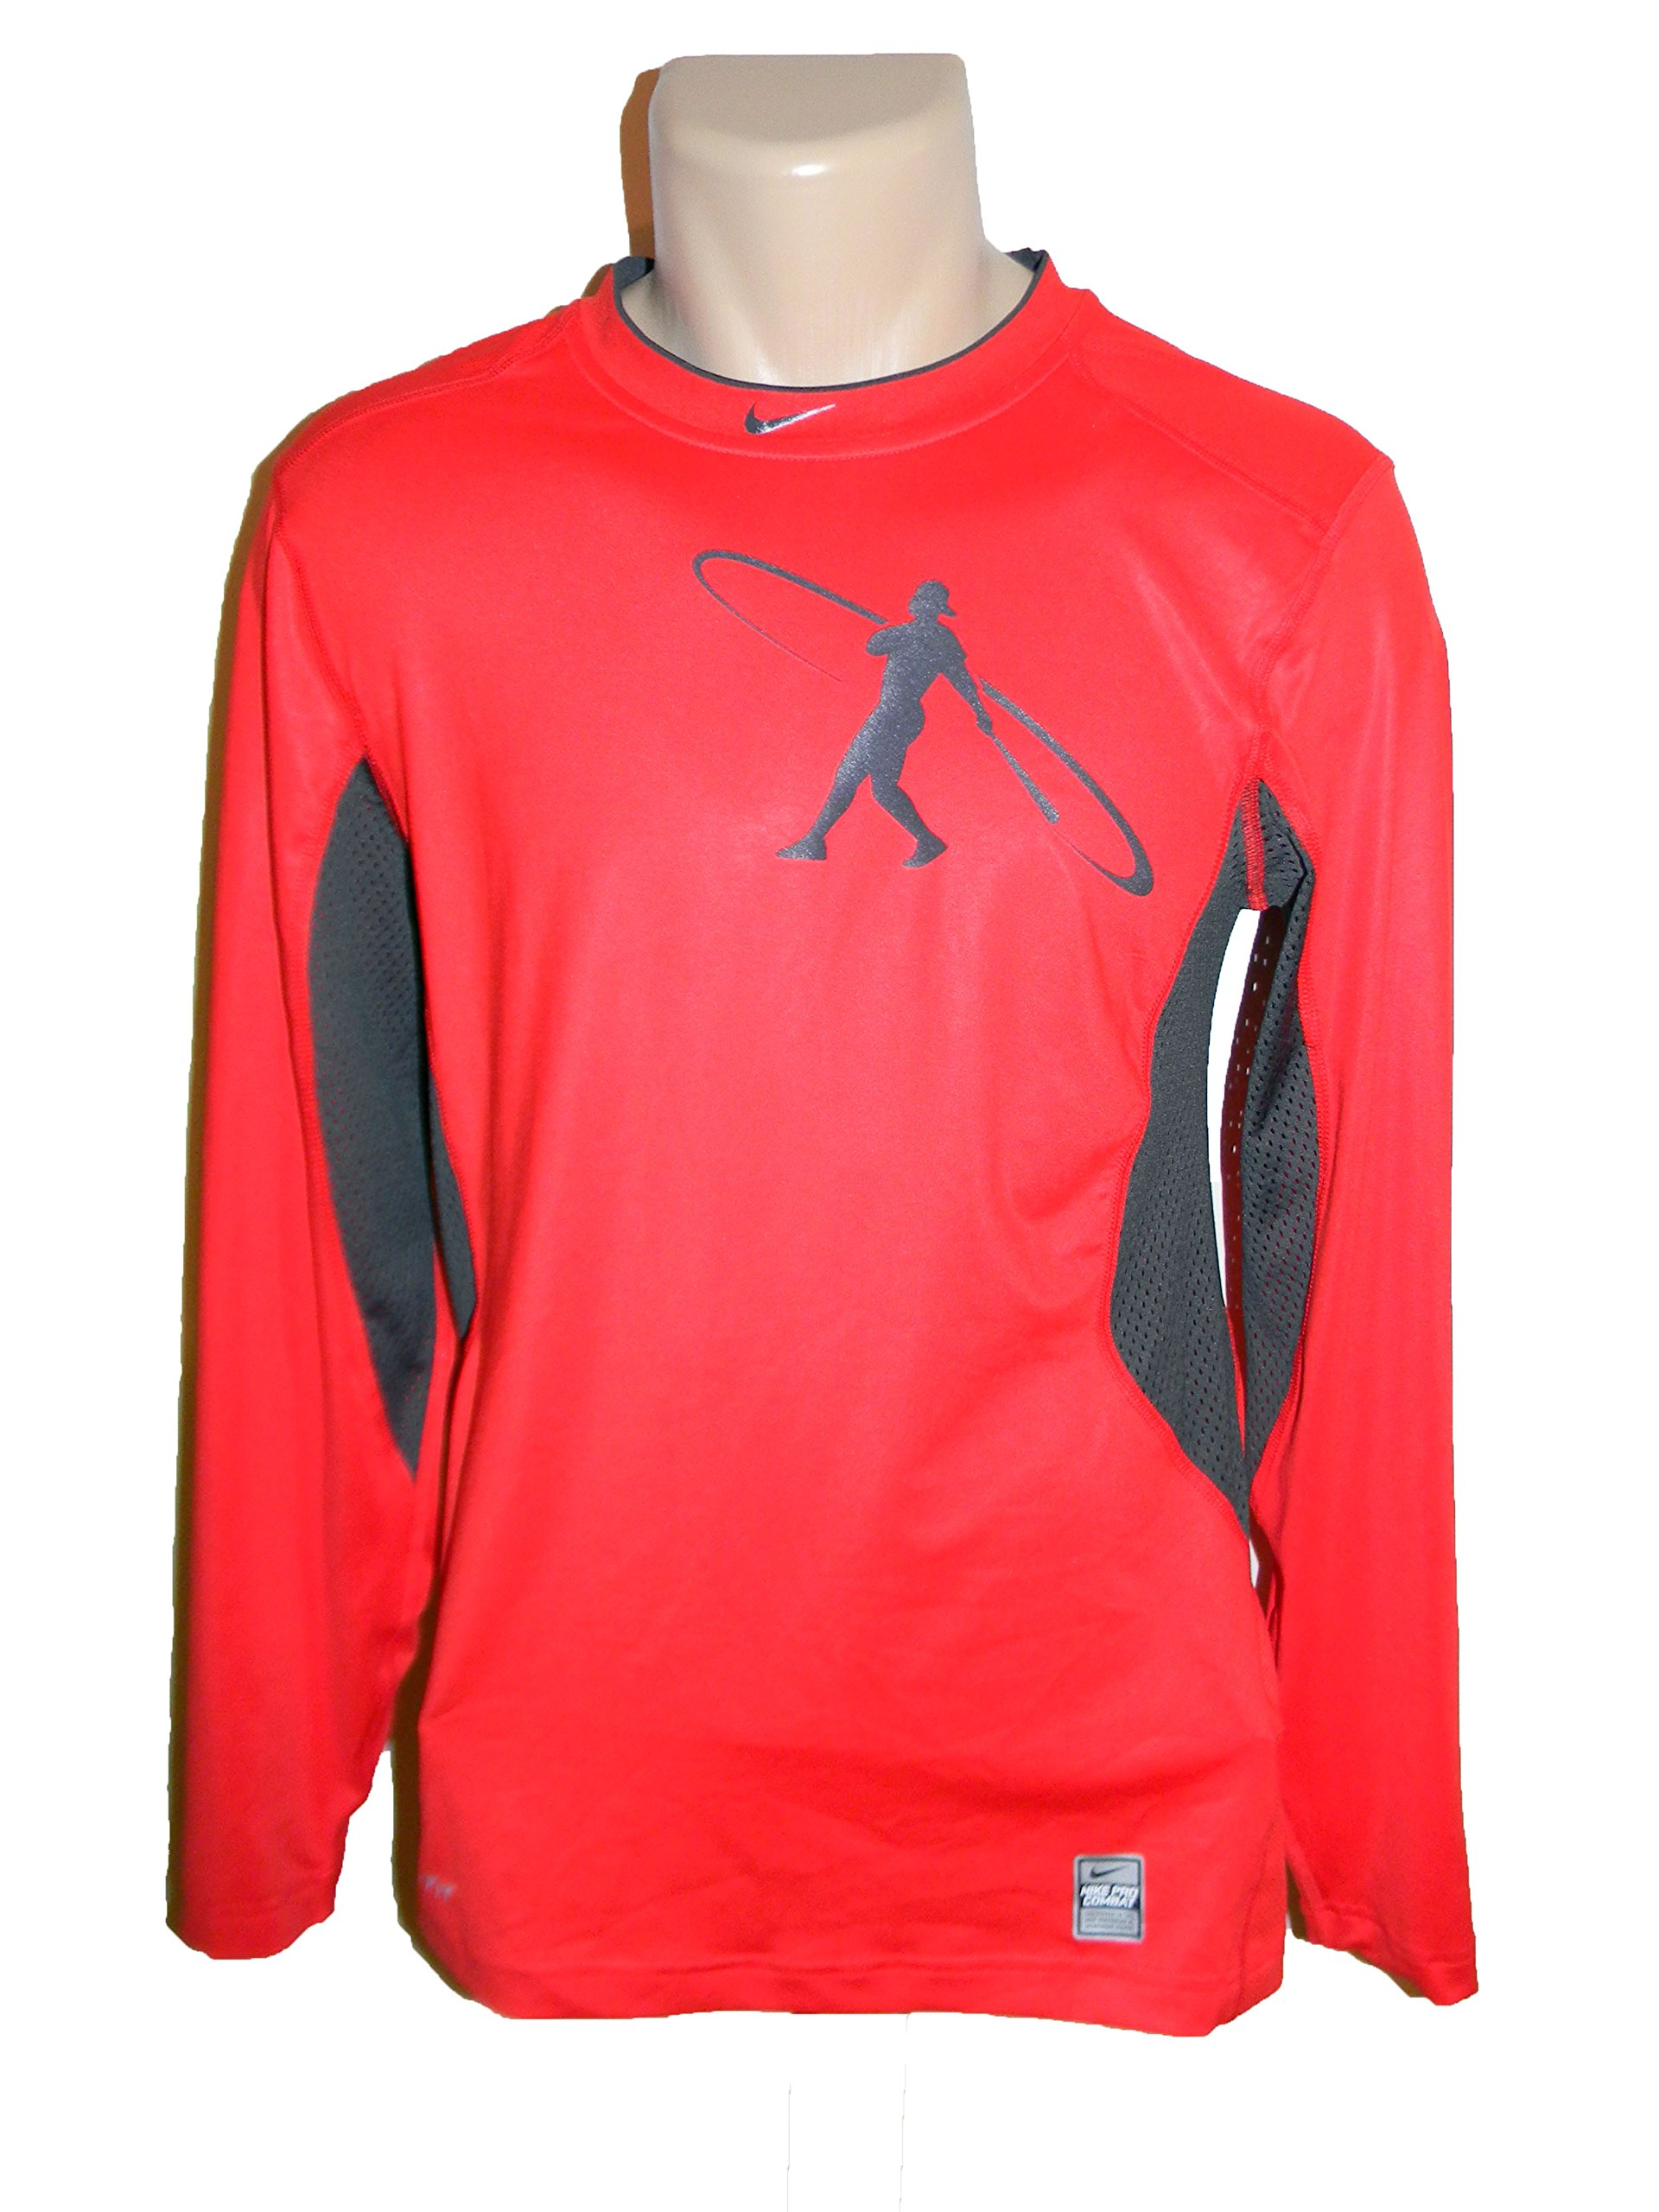 Nike Pro Combat Elite Compression Baseball Shirt